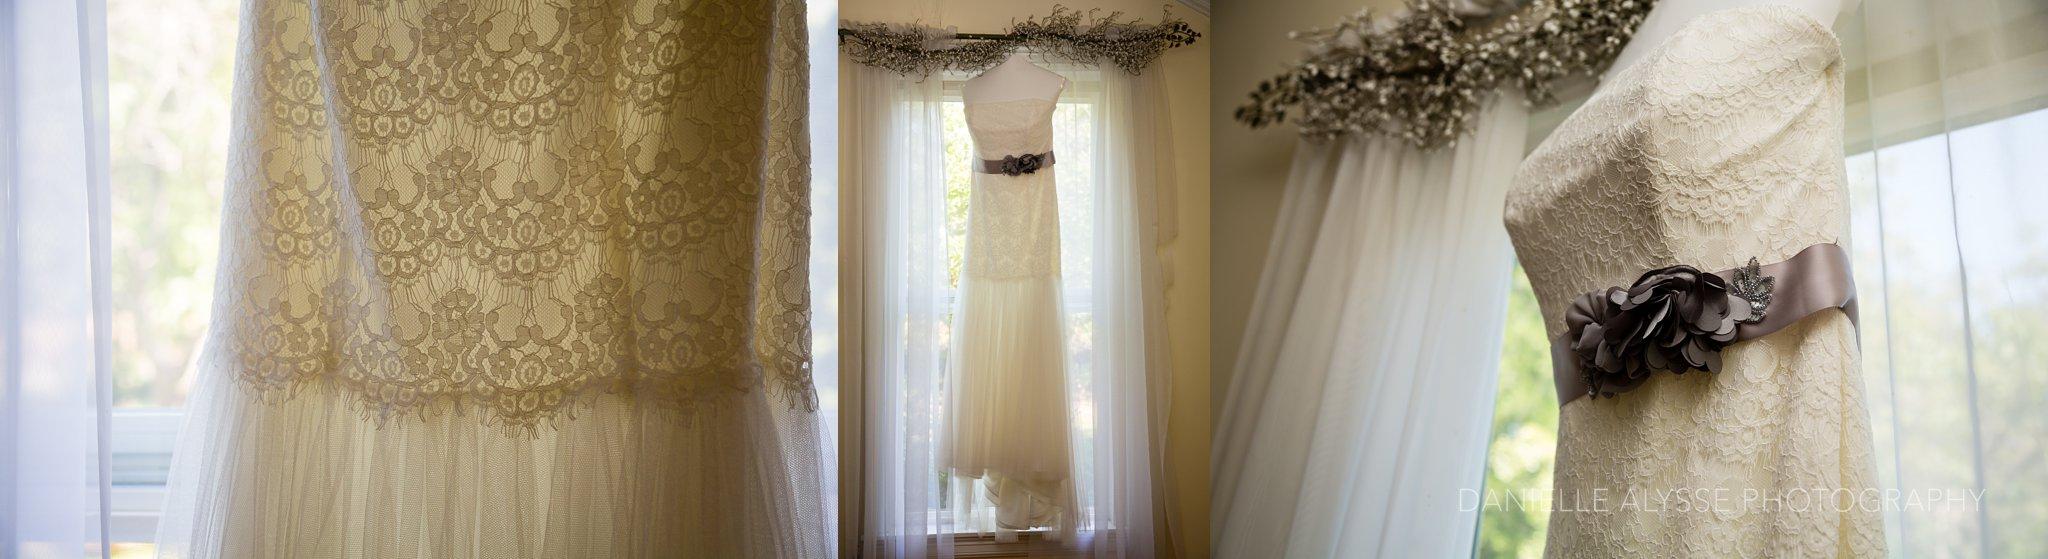 170507_blog_megan_david_wedding_loomis_flower_farm_inn_danielle_alysse_photography_sacramento_photographer0043_WEB.jpg